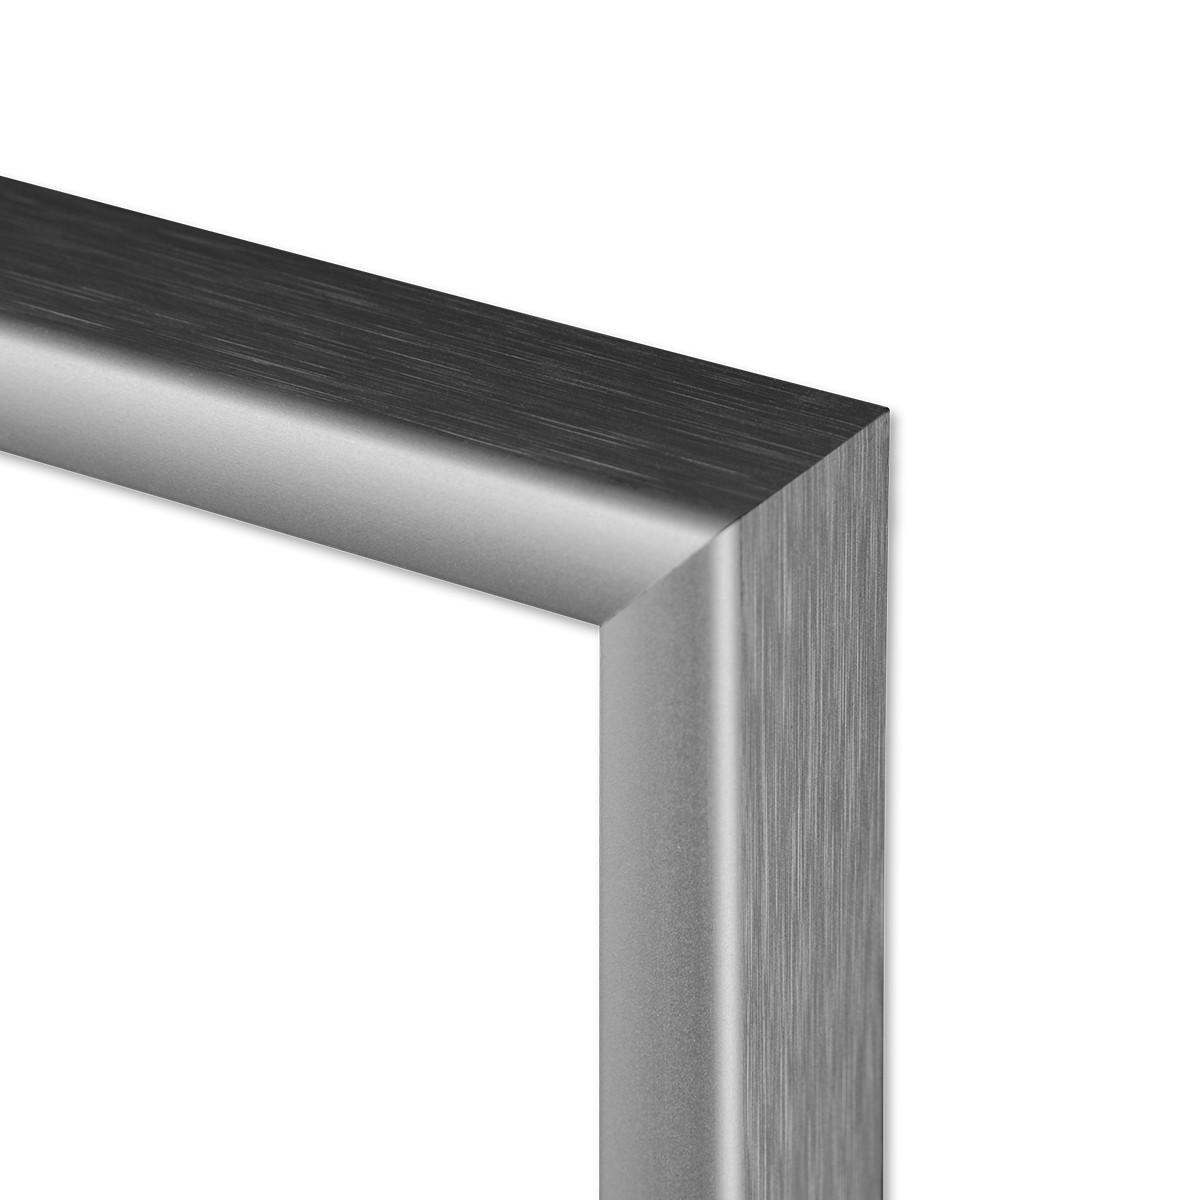 alu bilderrahmen 20x30 cm aluminium rahmen silber matt mit glasscheibe inkl zubeh r rahmen gr e. Black Bedroom Furniture Sets. Home Design Ideas